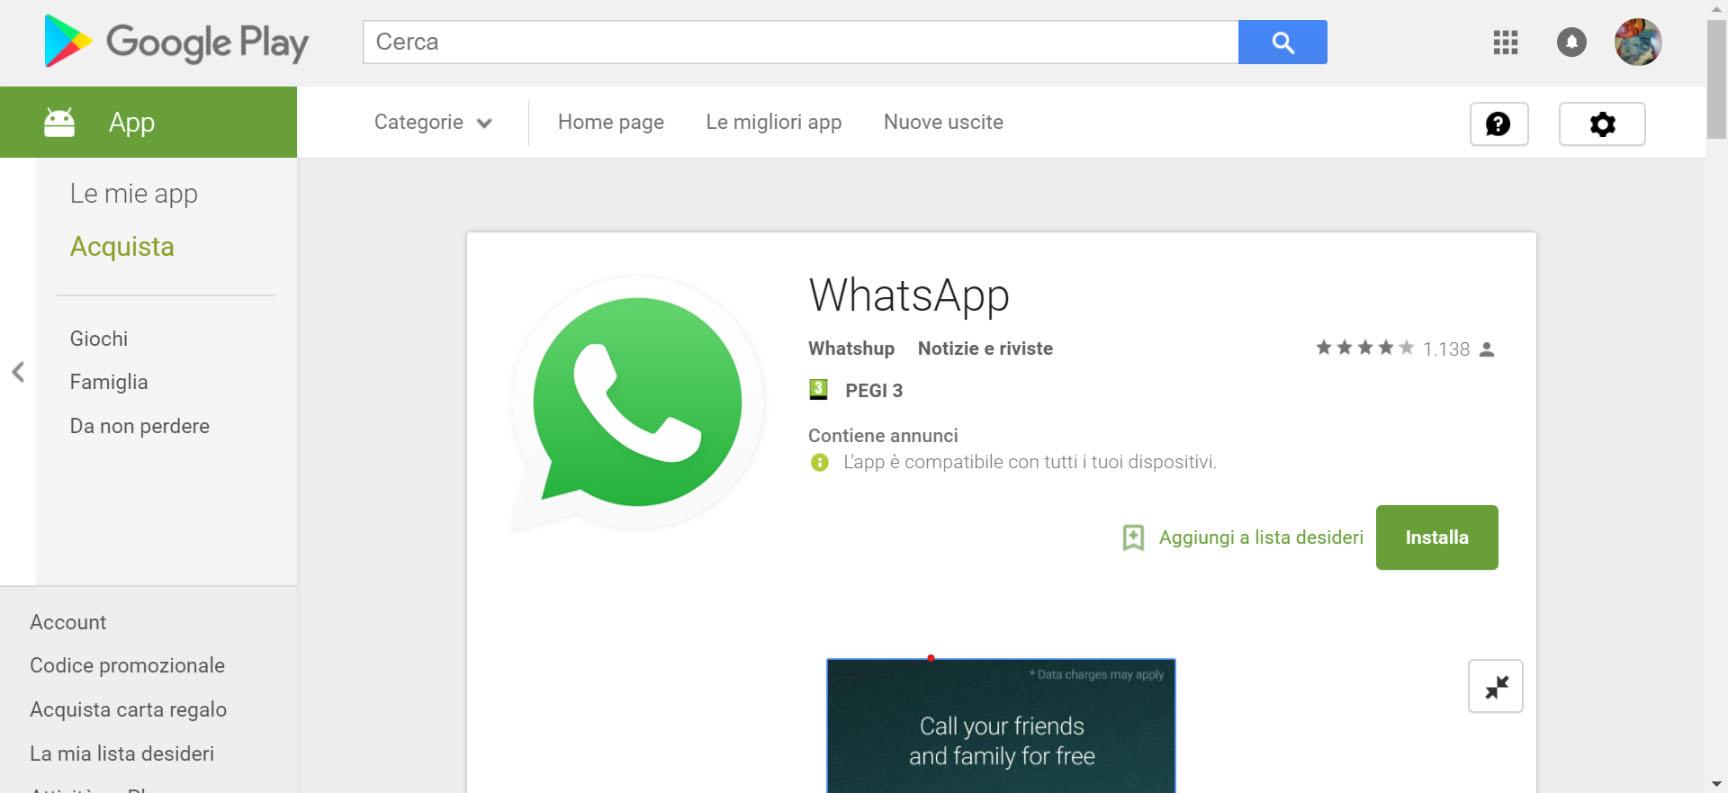 Whatshup la truffa del falso WhatsApp nel Google Play Store 2